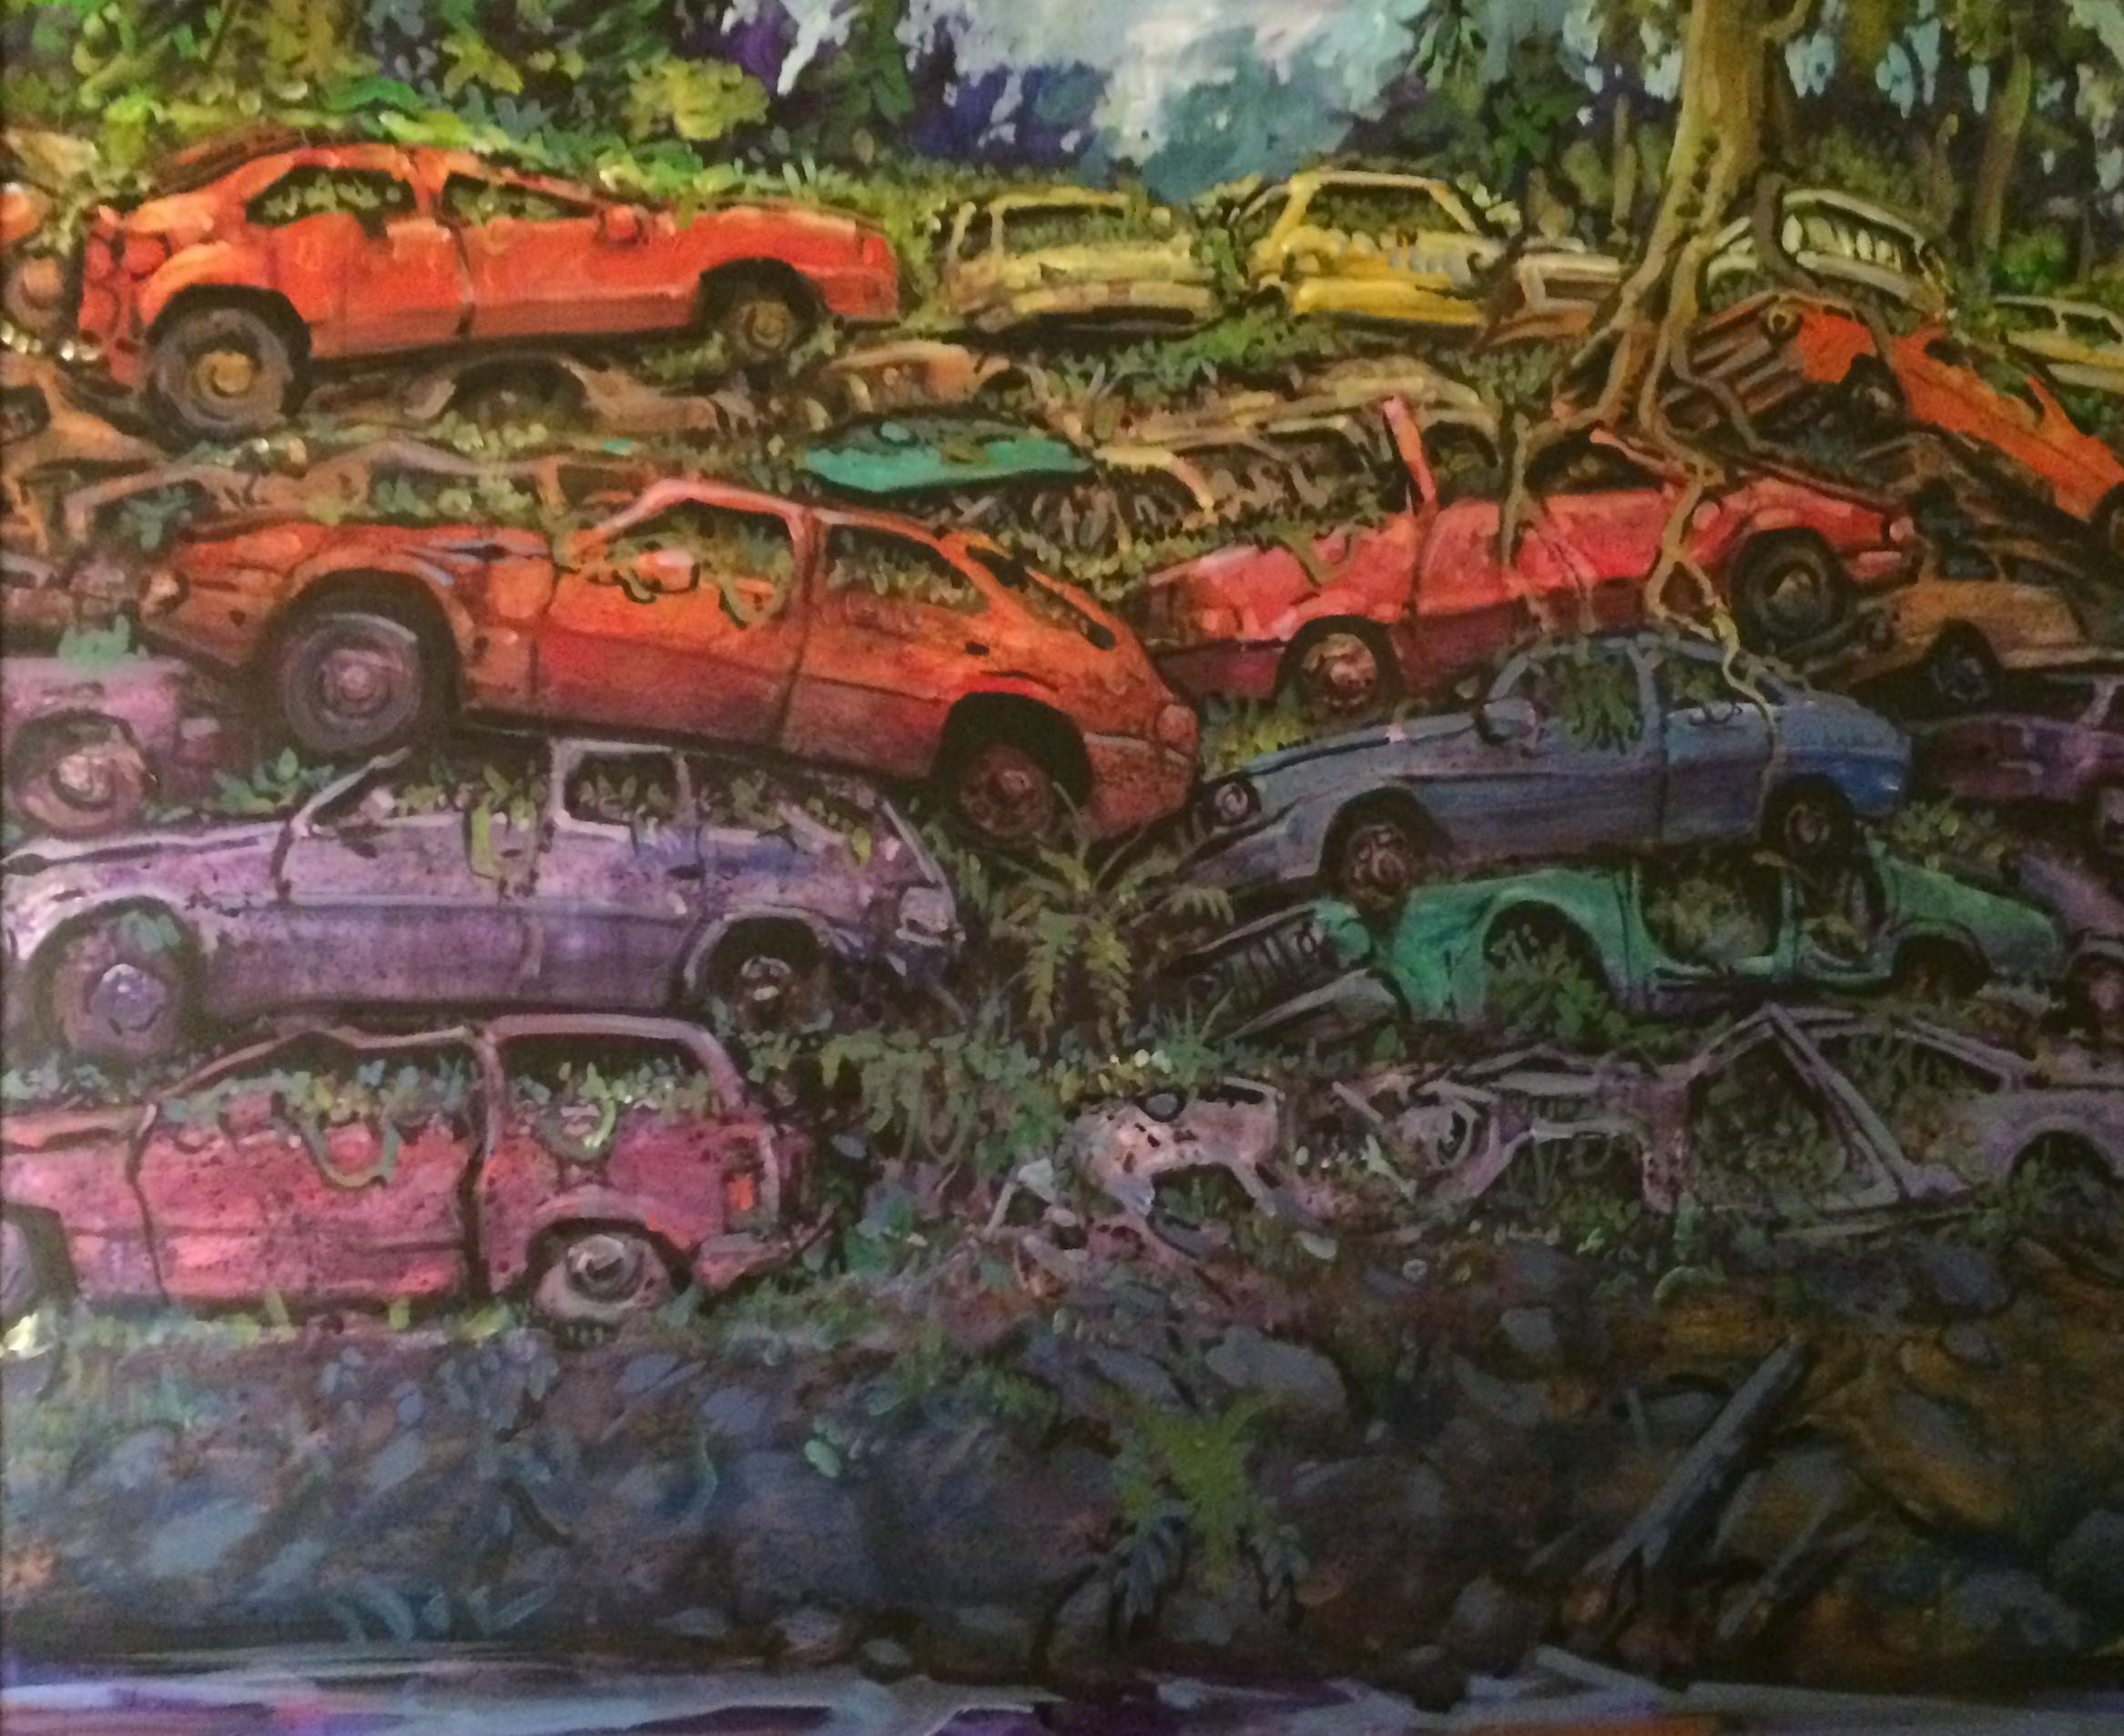 Decay live art